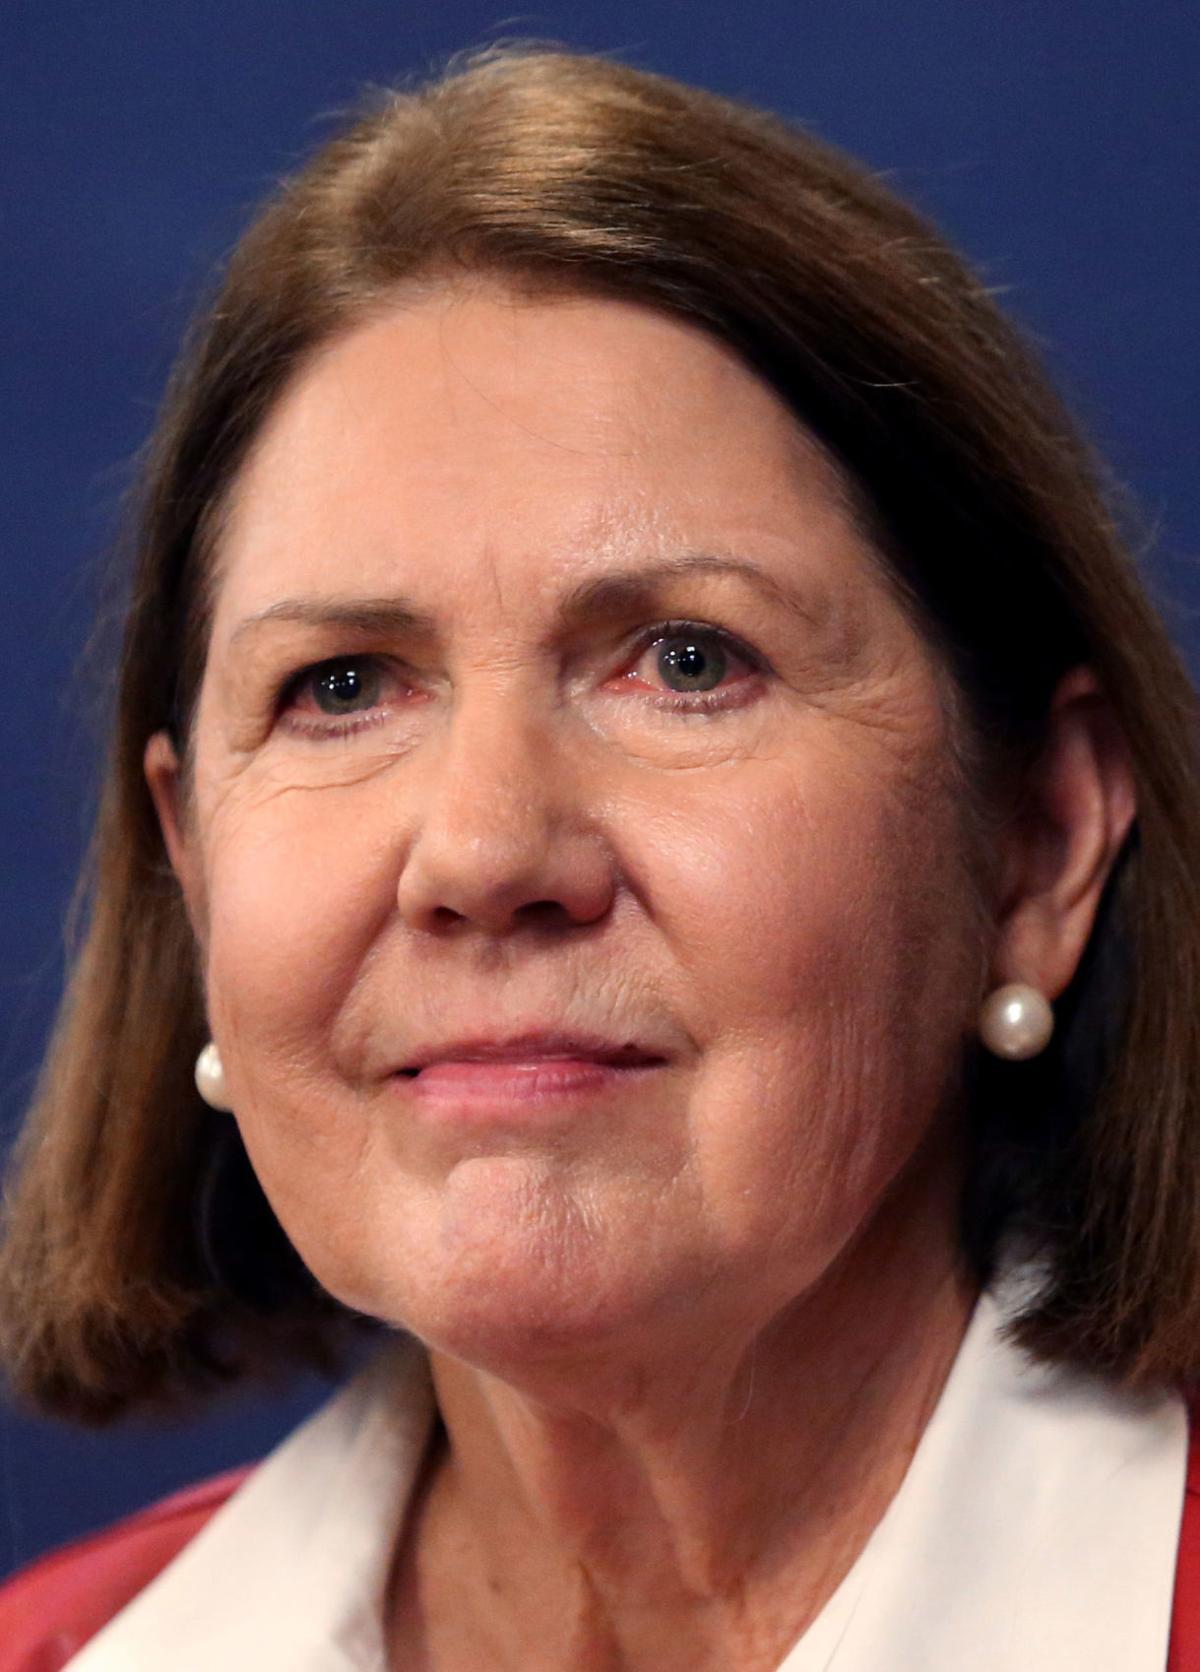 U.S. Rep. Ann Kirkpatrick